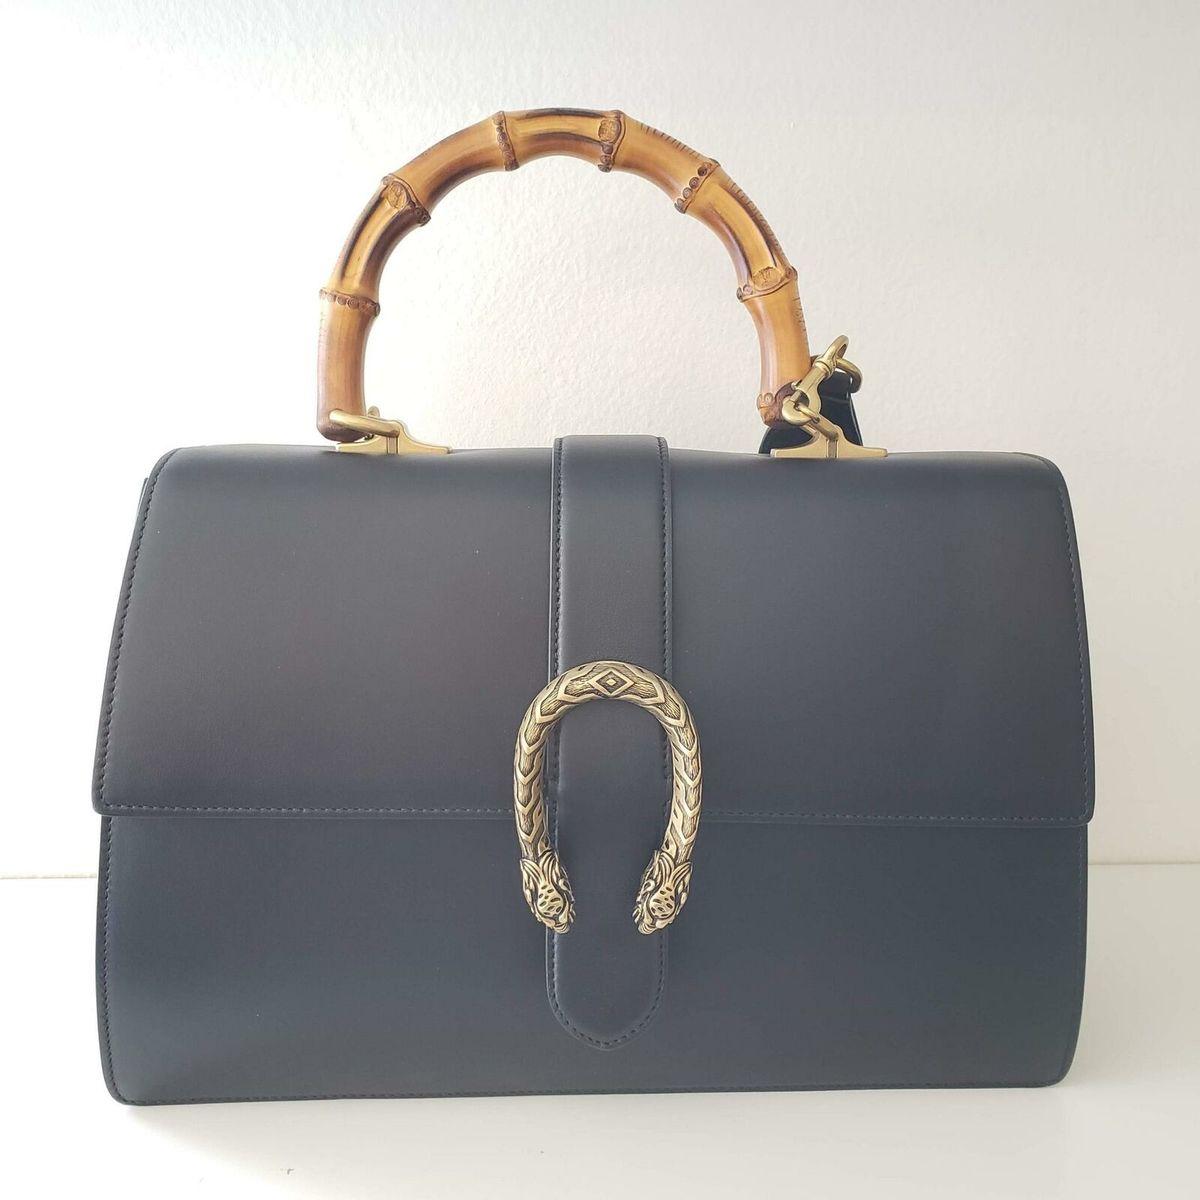 Gucci グッチ ディオニュソス ラージ バンブー トップ ハンドル レザー バッグ ブラック Dionysus Large Bamboo Top Handle Leather Bag | Black | NEW